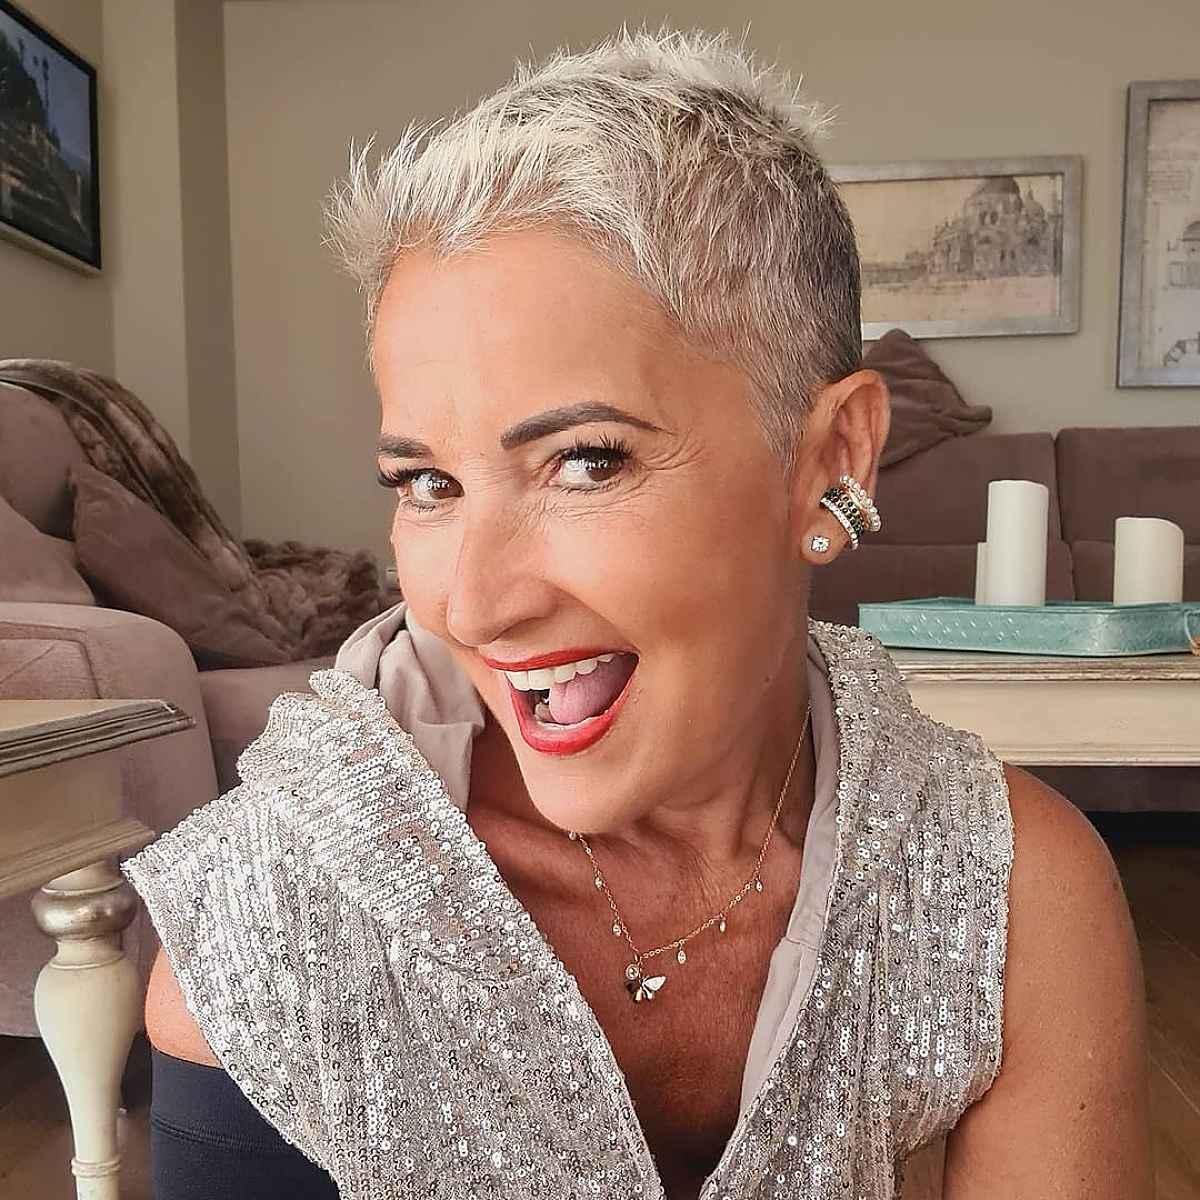 Pixie Pixie para cabello corto para mujeres mayores